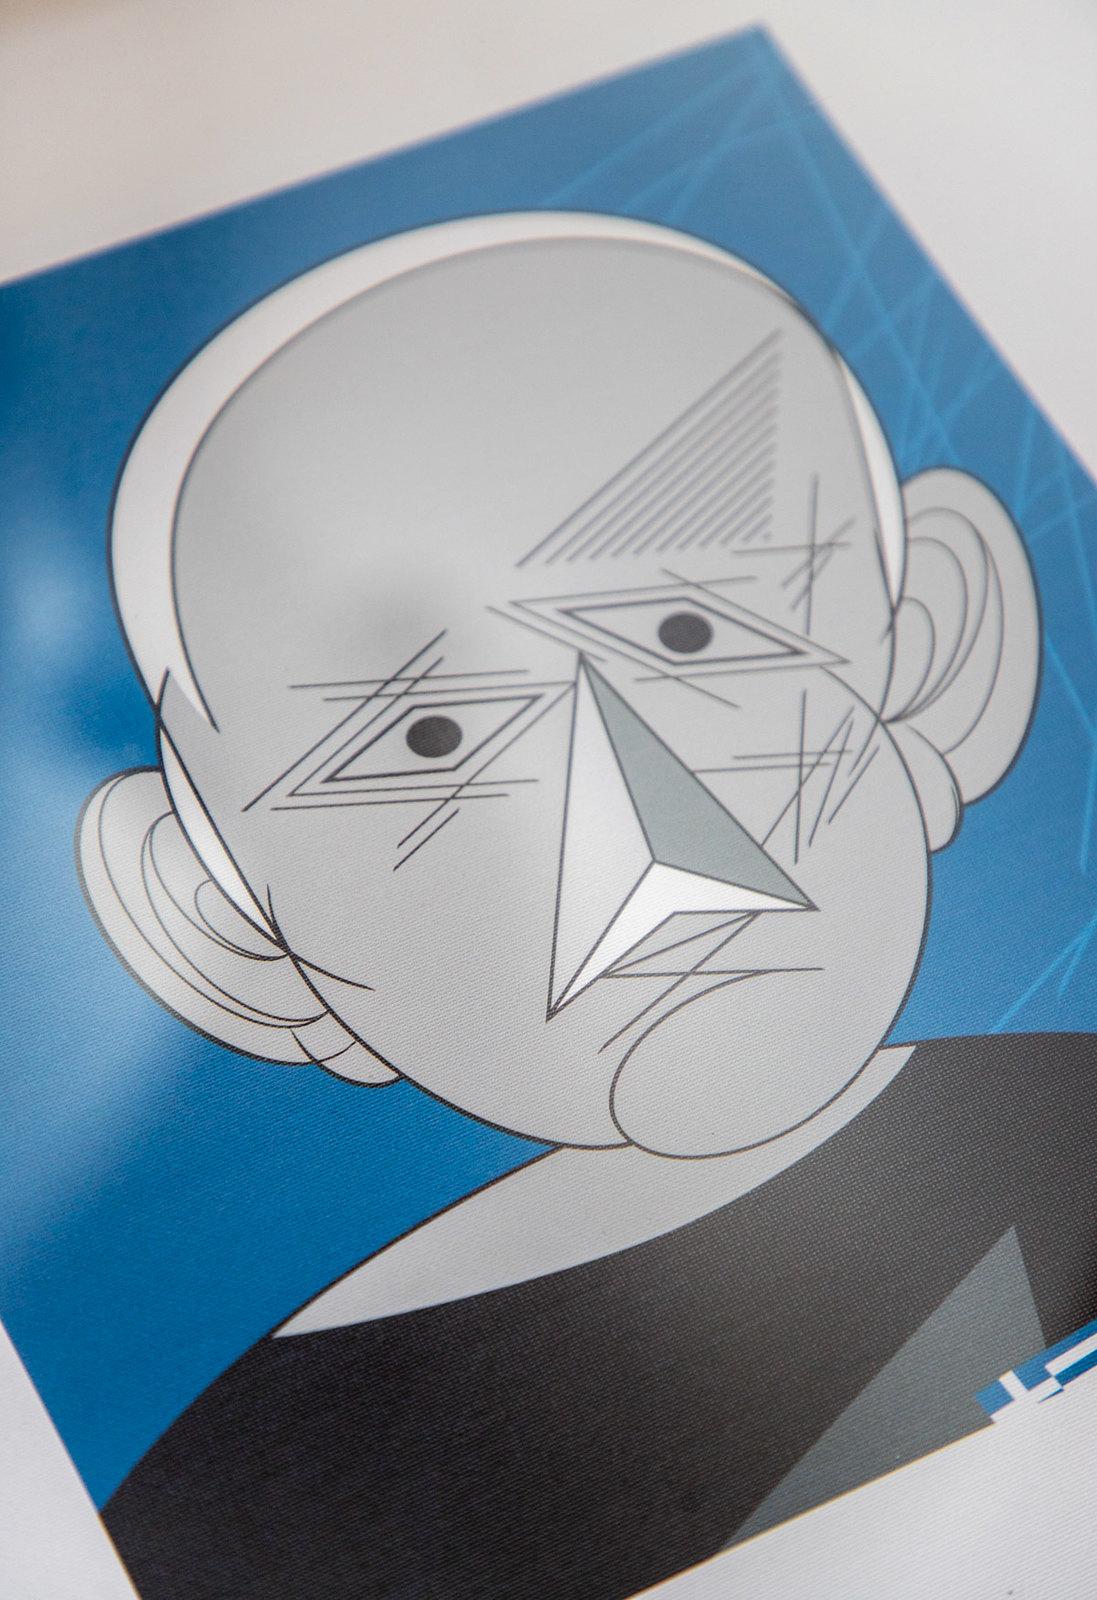 Výstava Autoportét: identita – realita?  @ Galerie Hollar, Praha